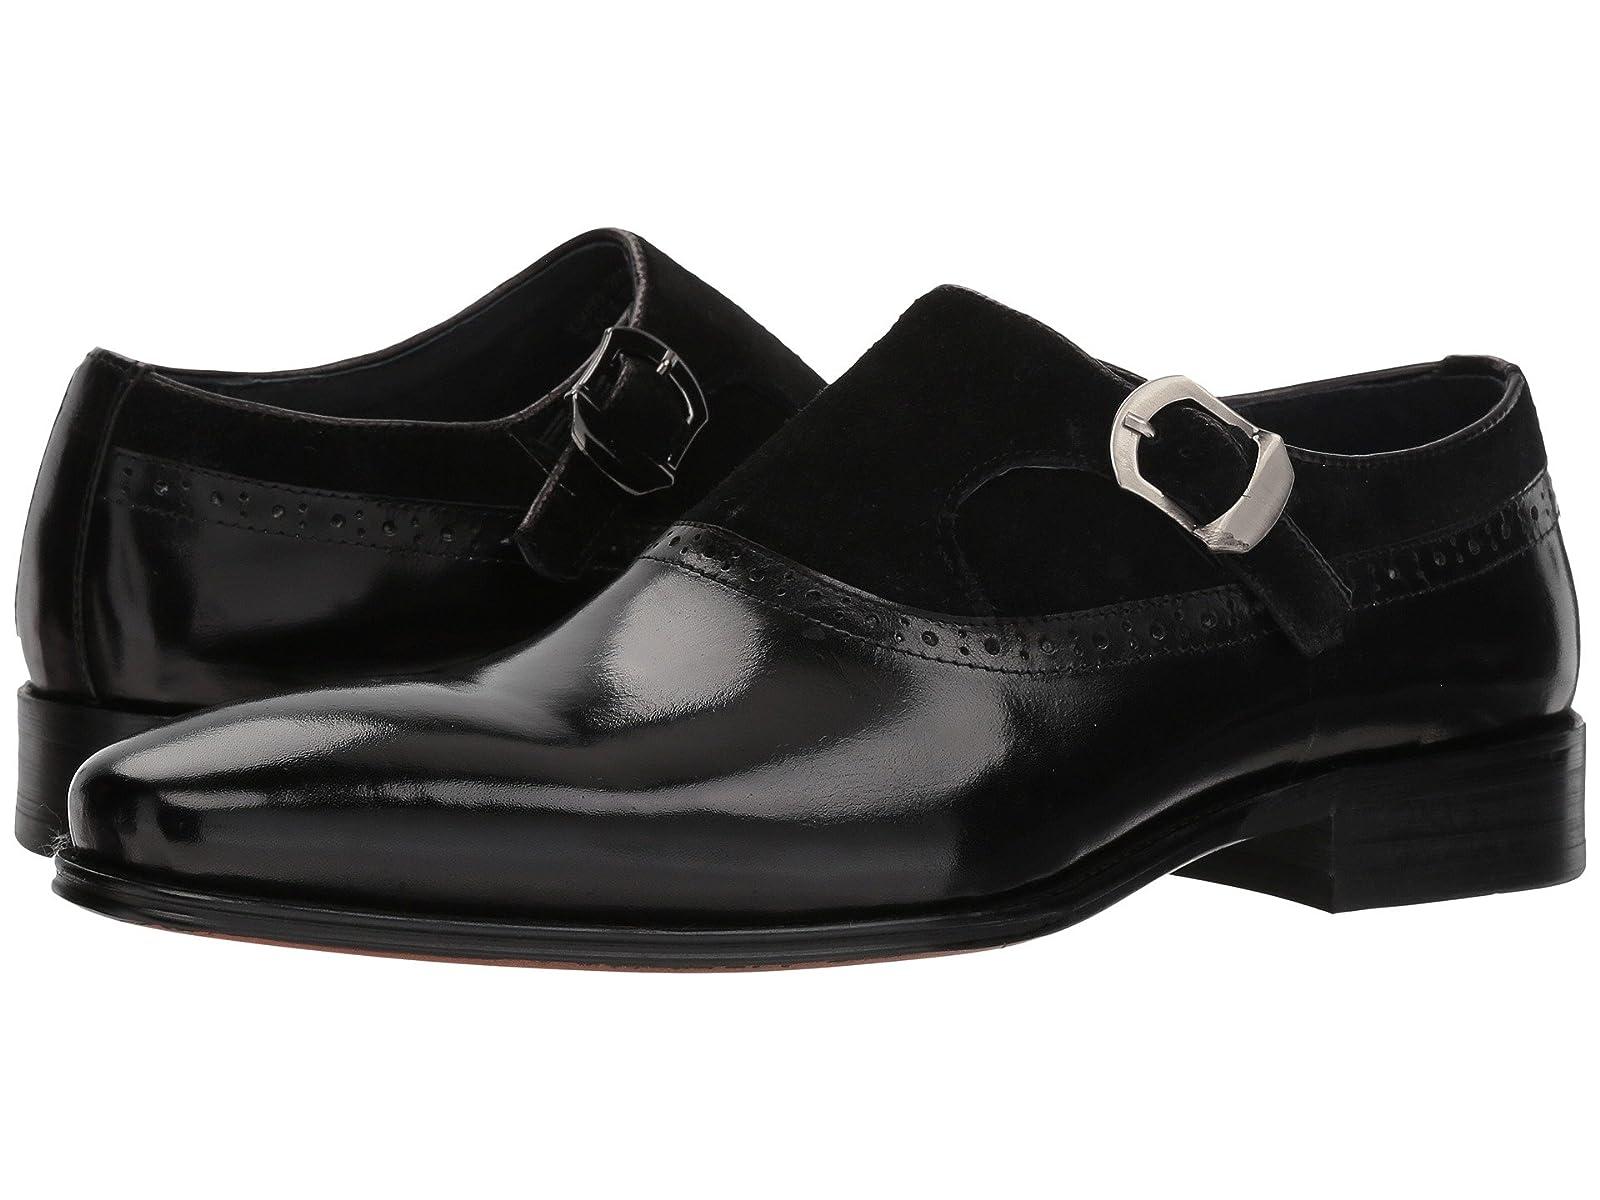 Carrucci ColtraneAtmospheric grades have affordable shoes